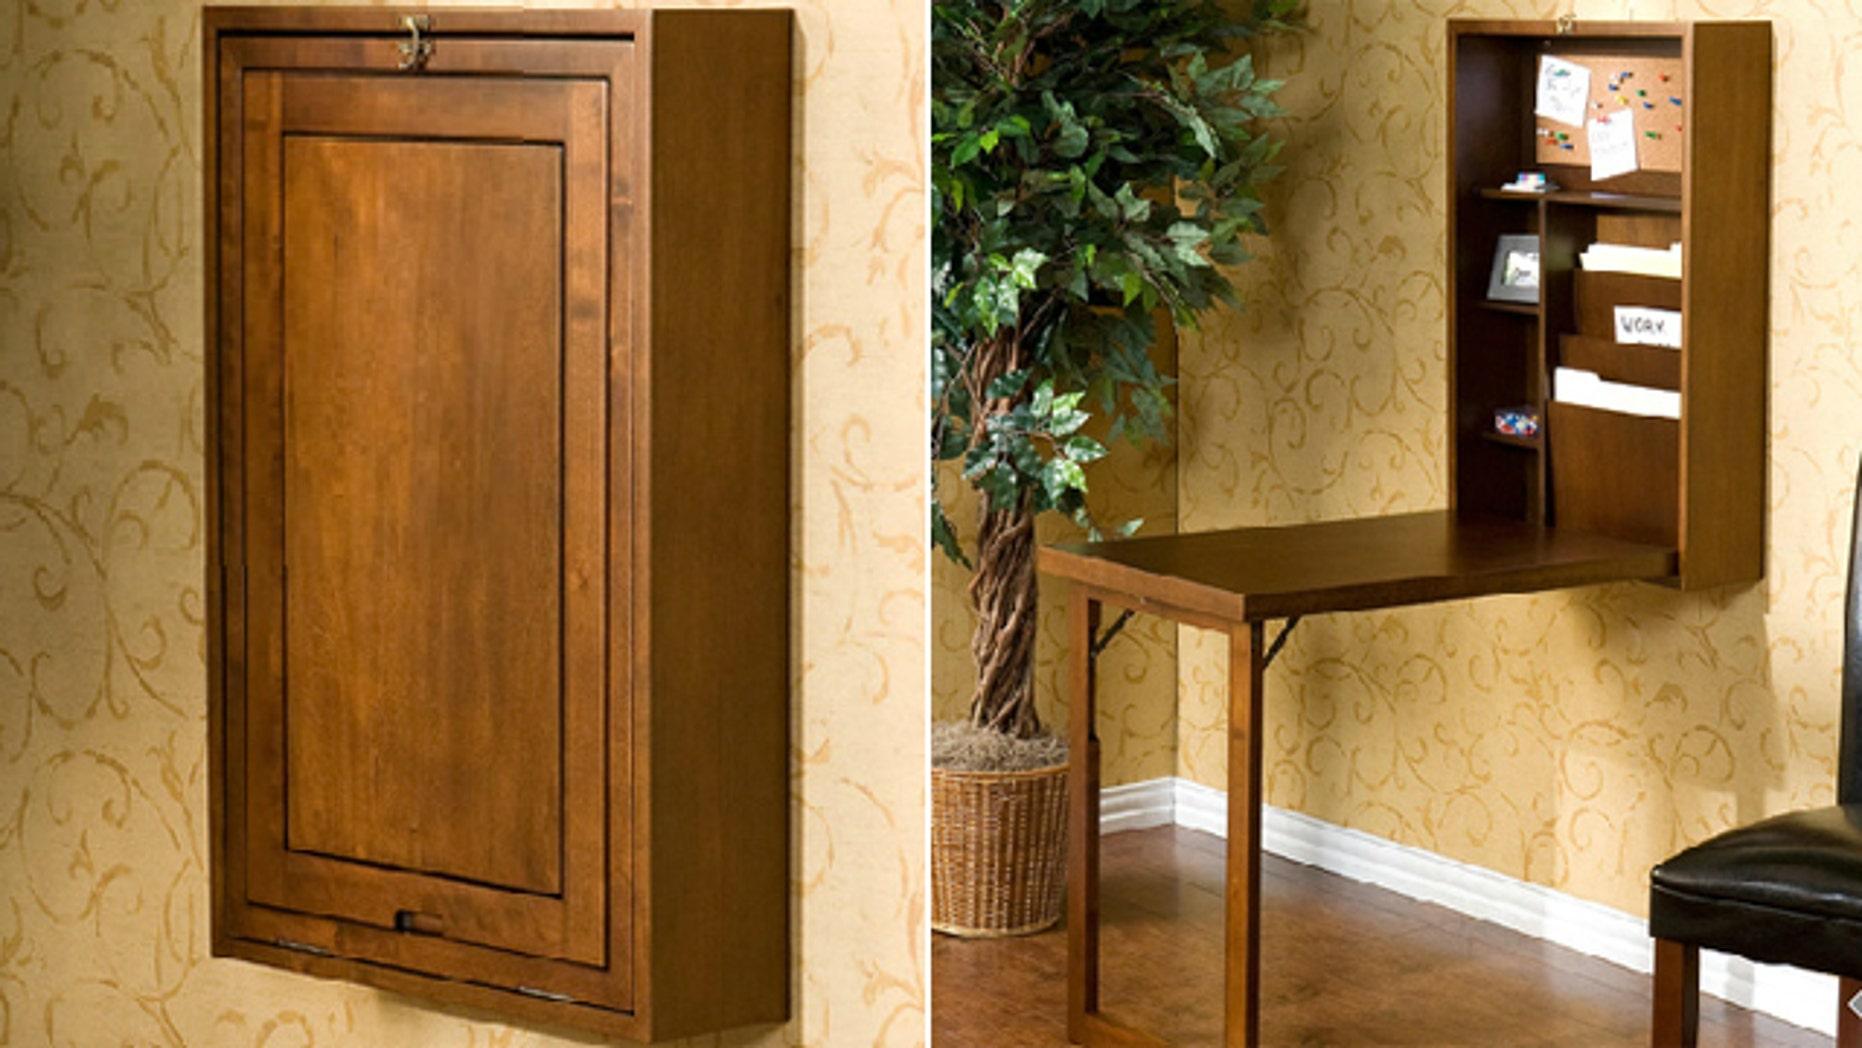 Designer picks discrete desks for small spaces fox news - Armoire for small spaces ...